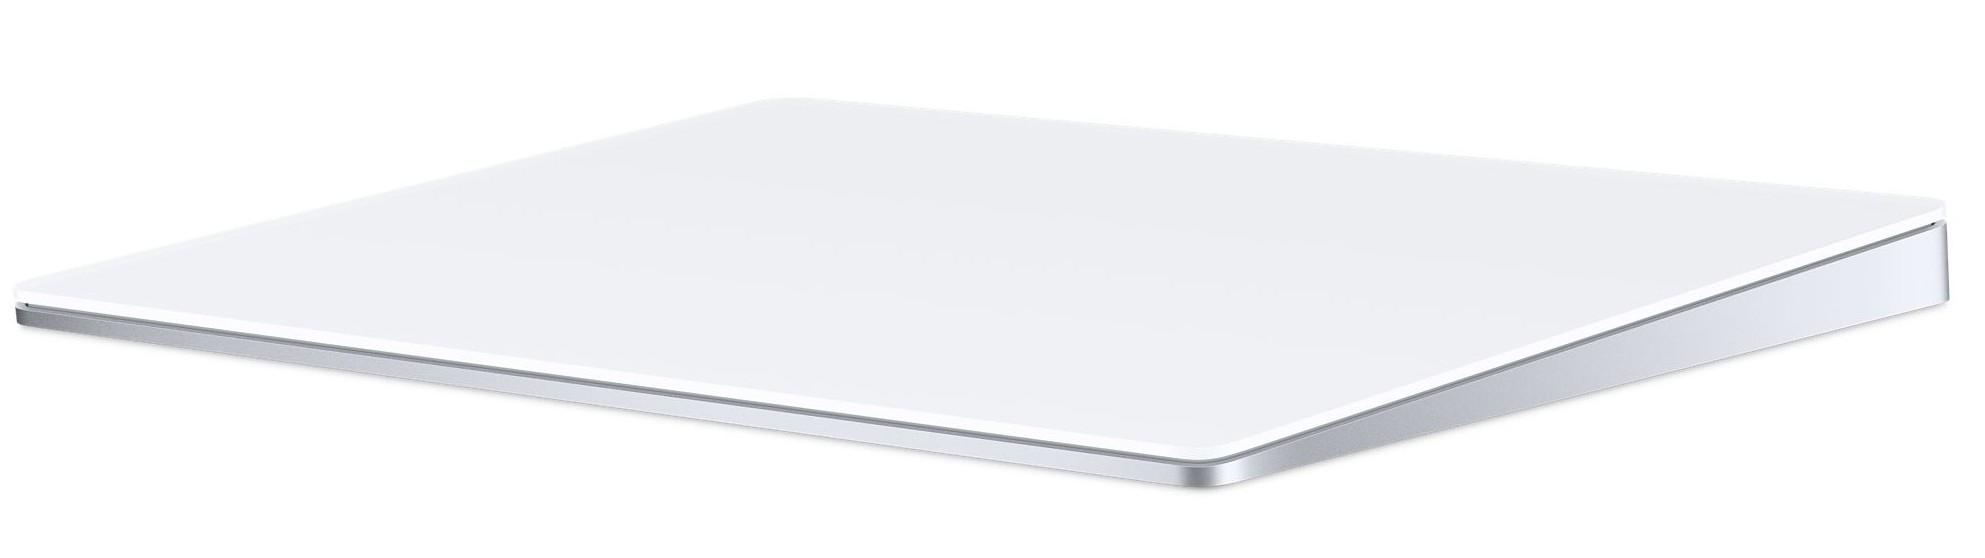 Magic Trackpad of Magic Mouse? Welke moet je hebben?